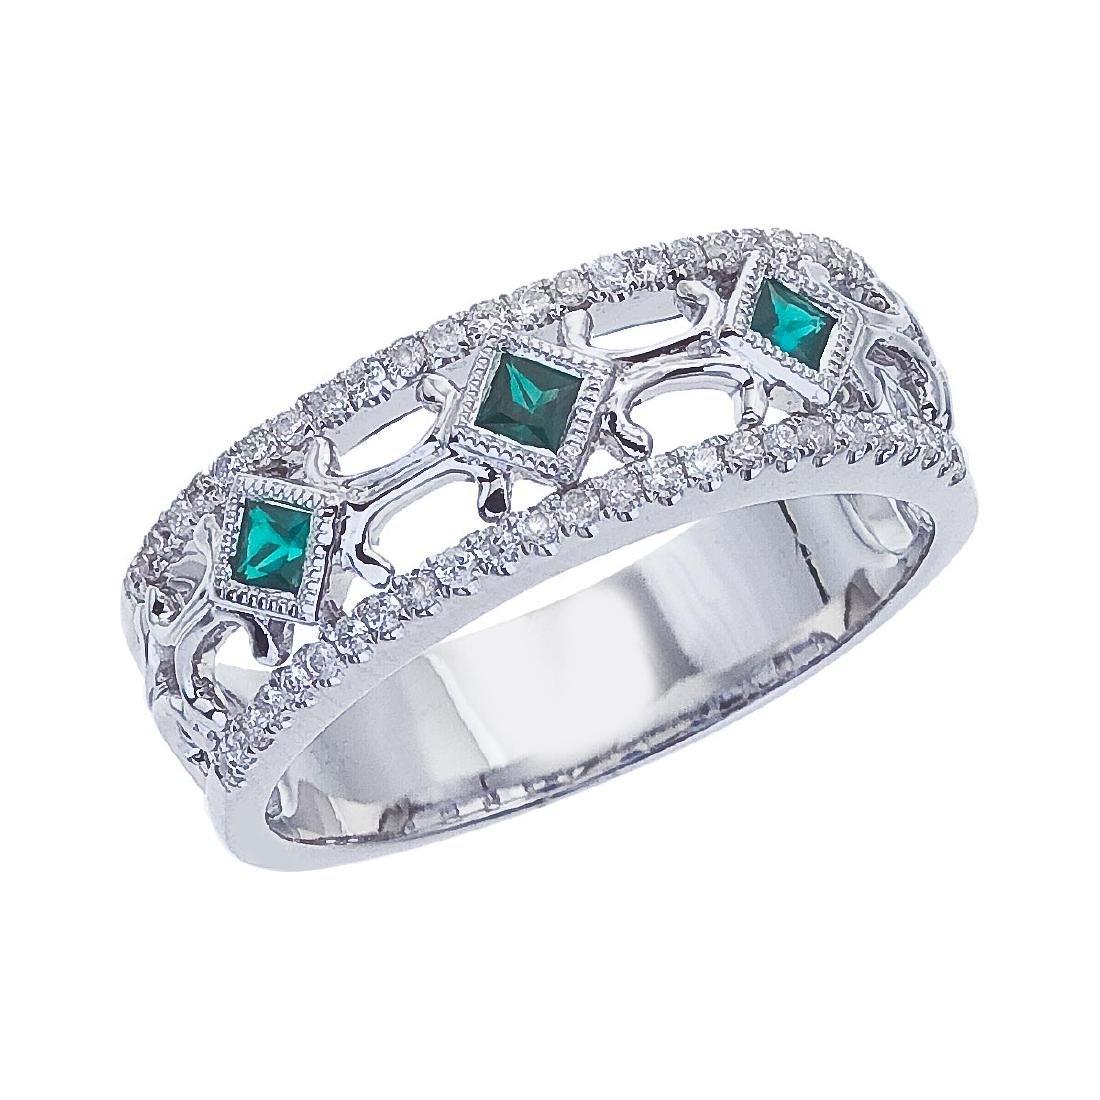 Certified 14k White Gold Emerald Diamond Open Band 0.43